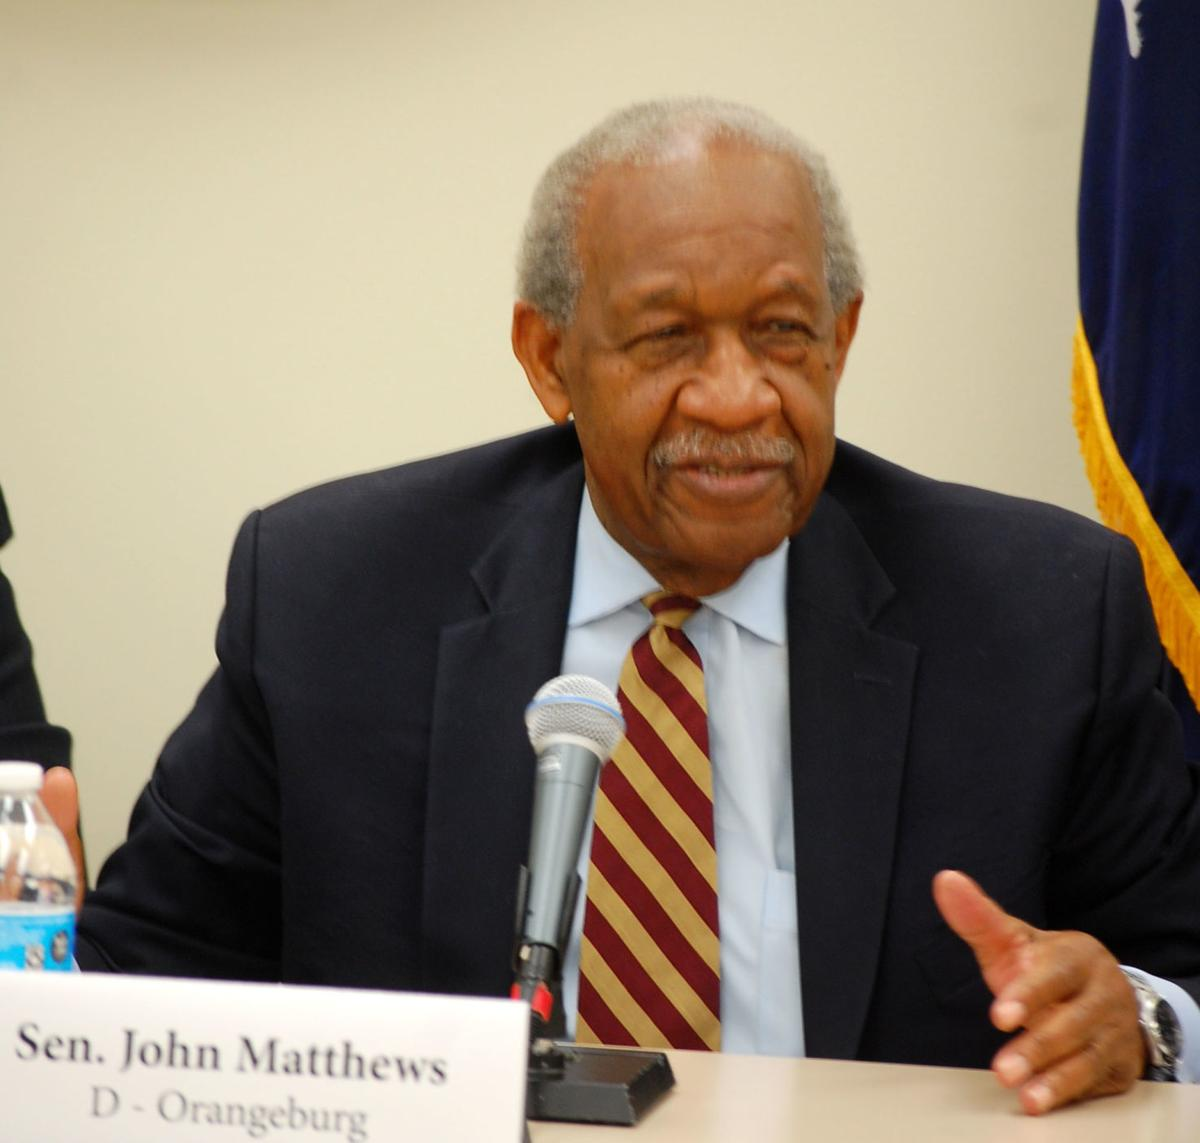 Sen. John Matthews